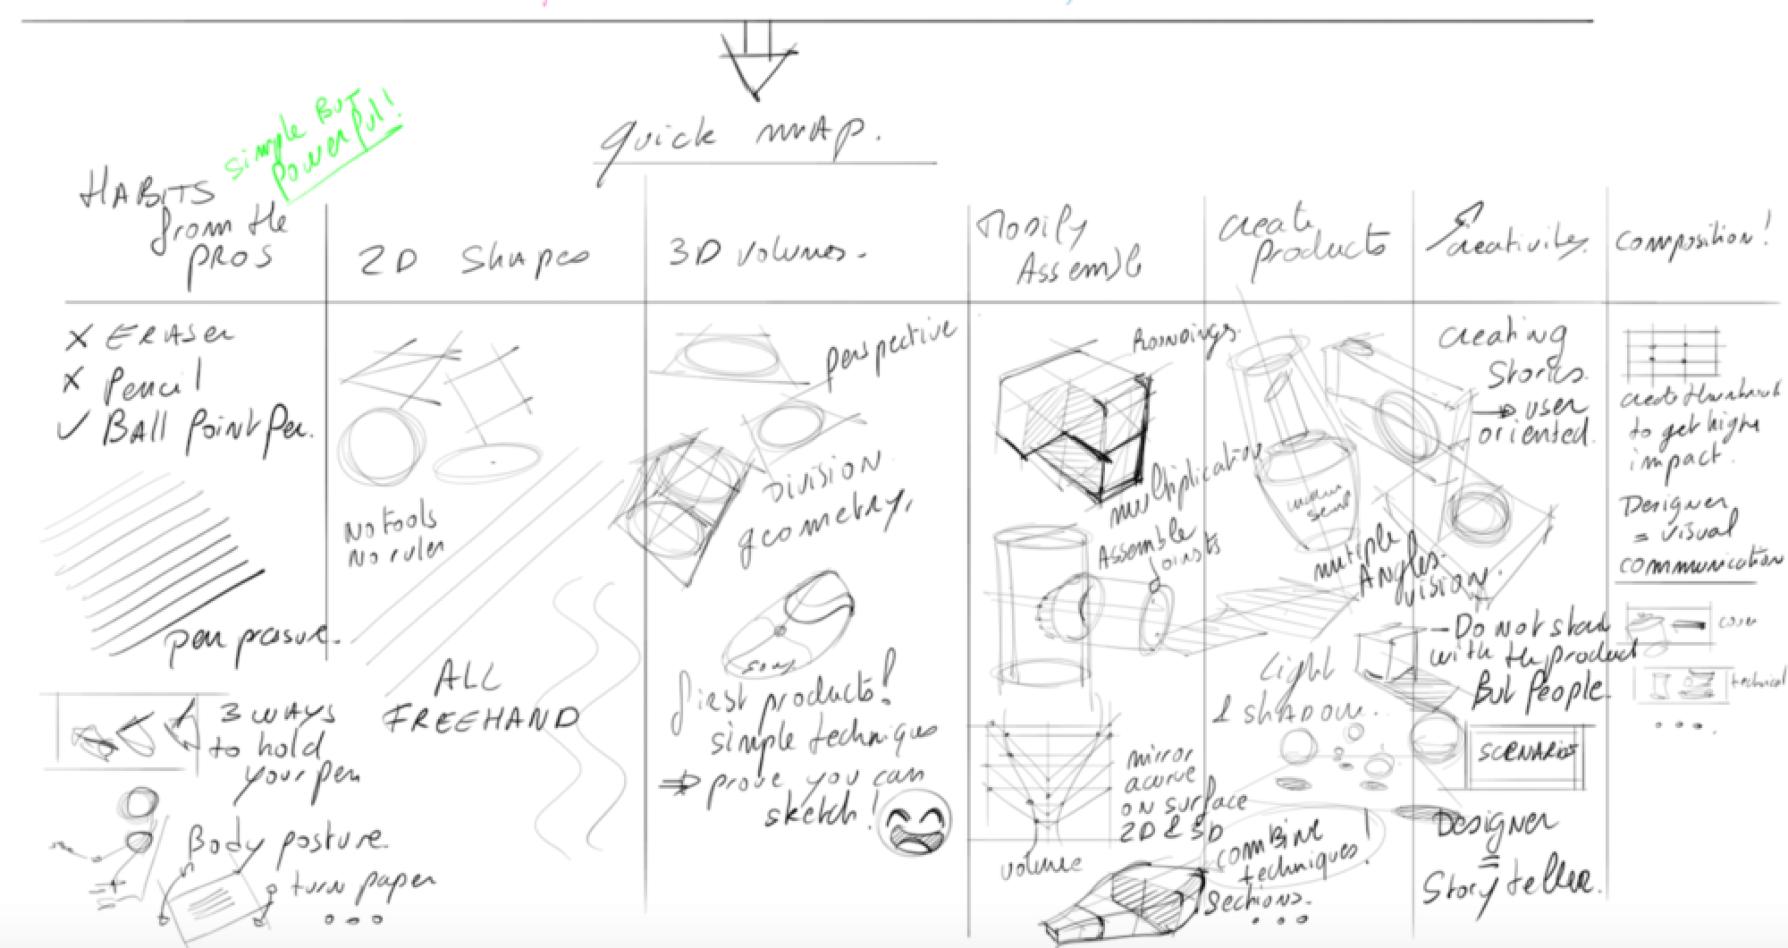 Quick map sketching fundamentals.png